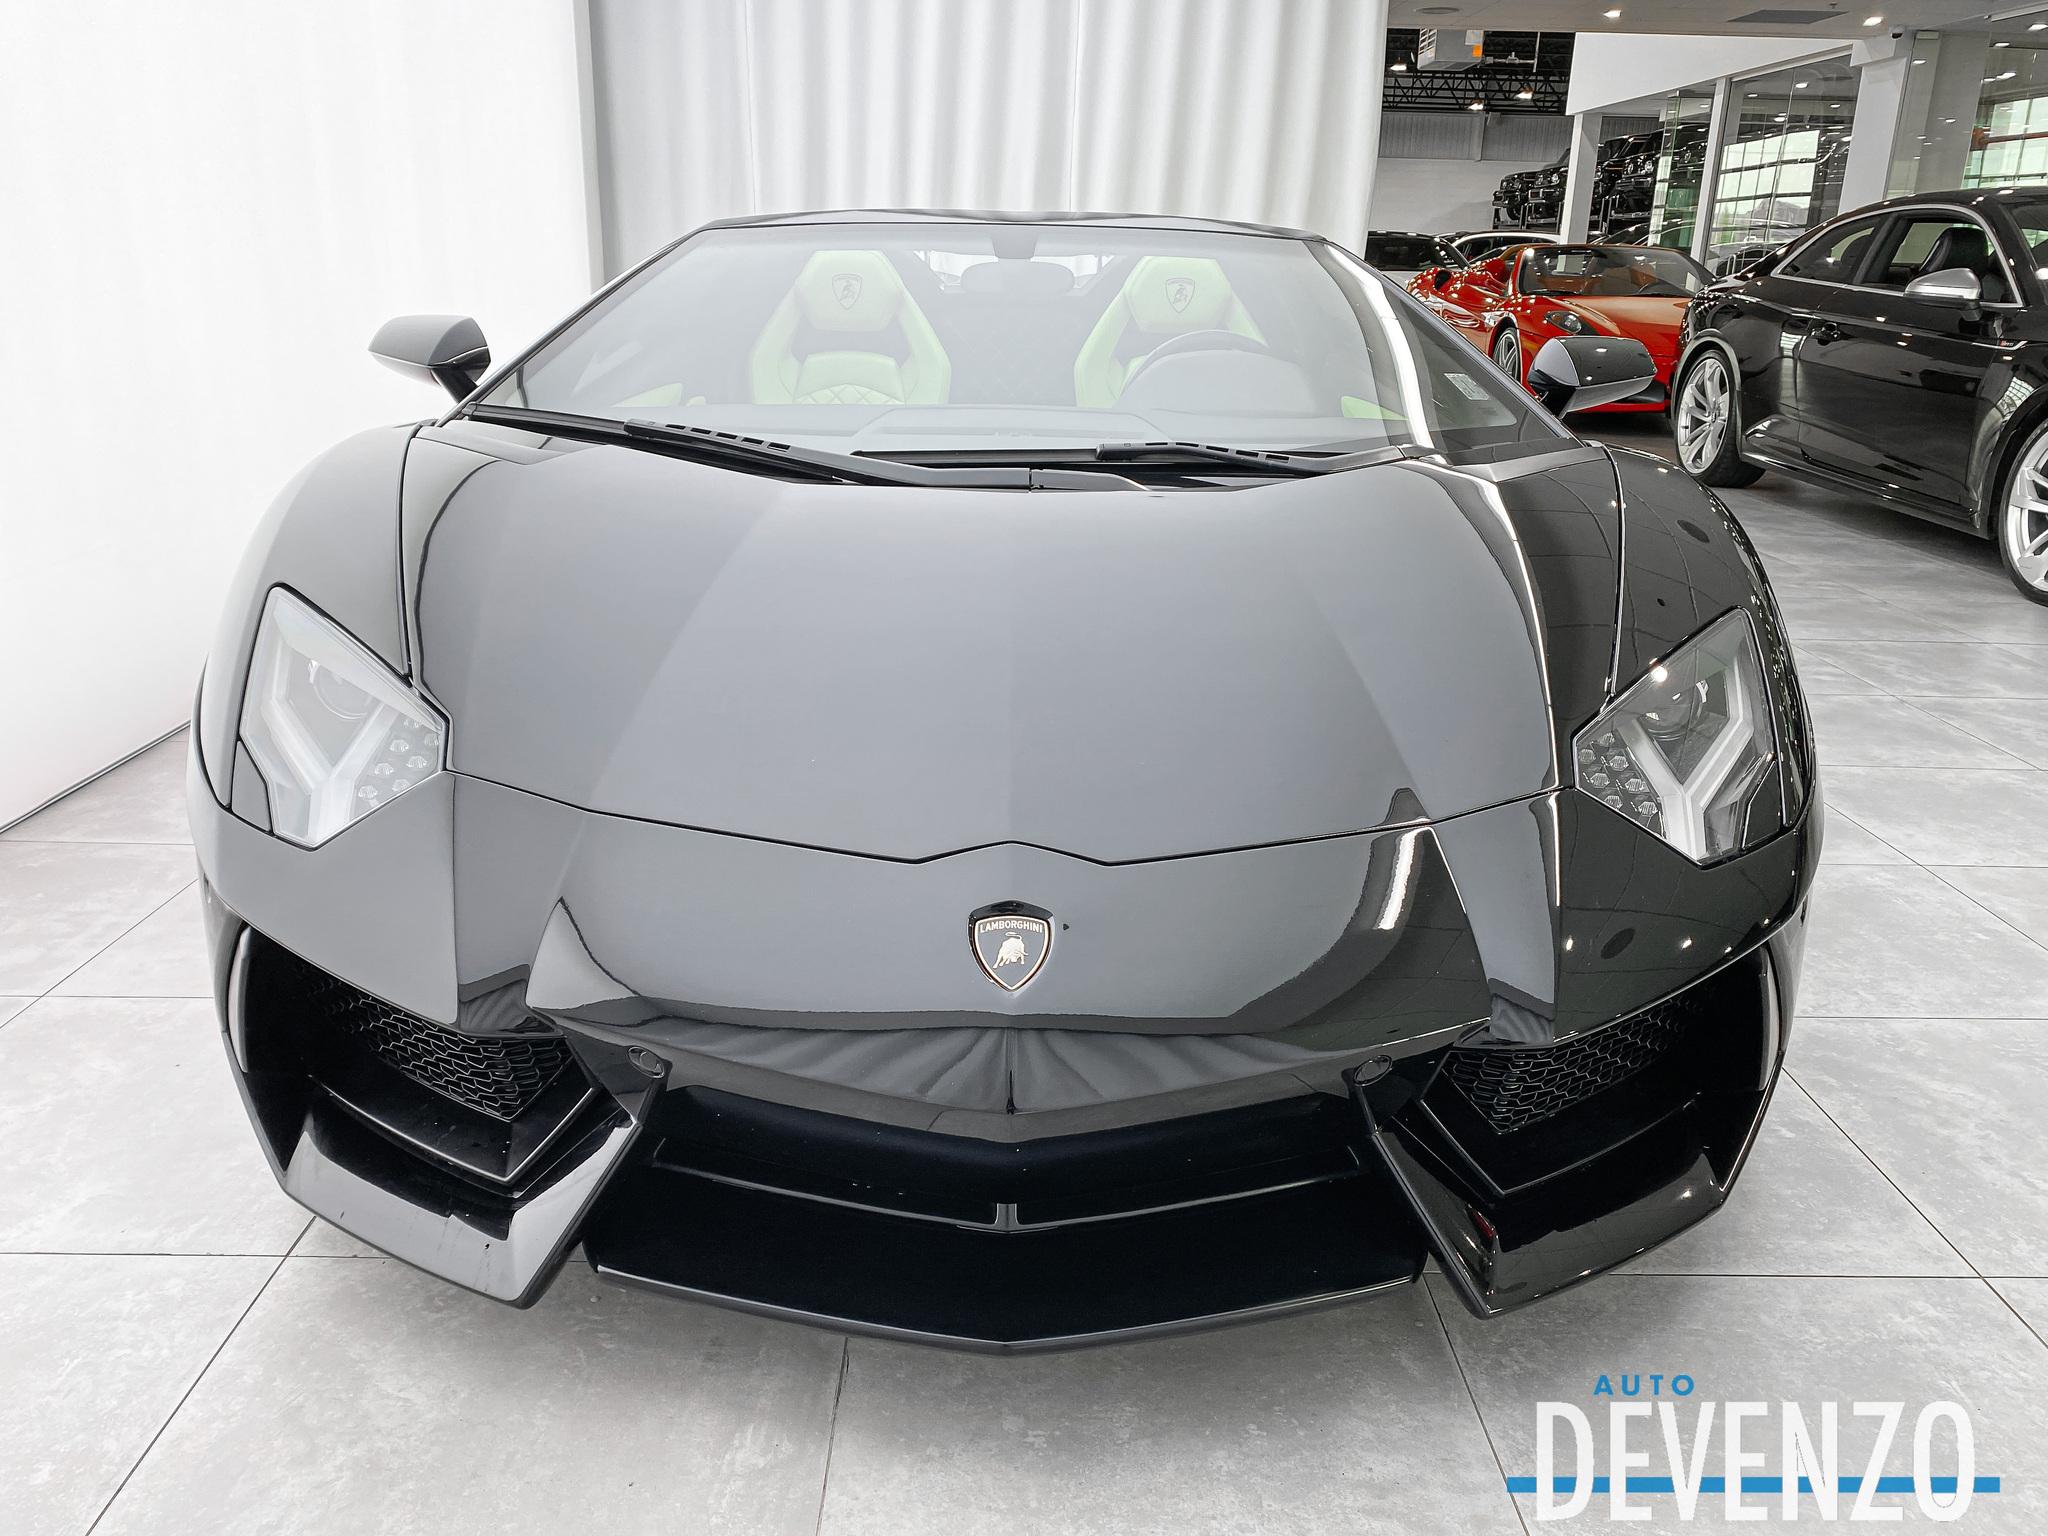 2016 Lamborghini Aventador LP700-4 ROADSTER complet